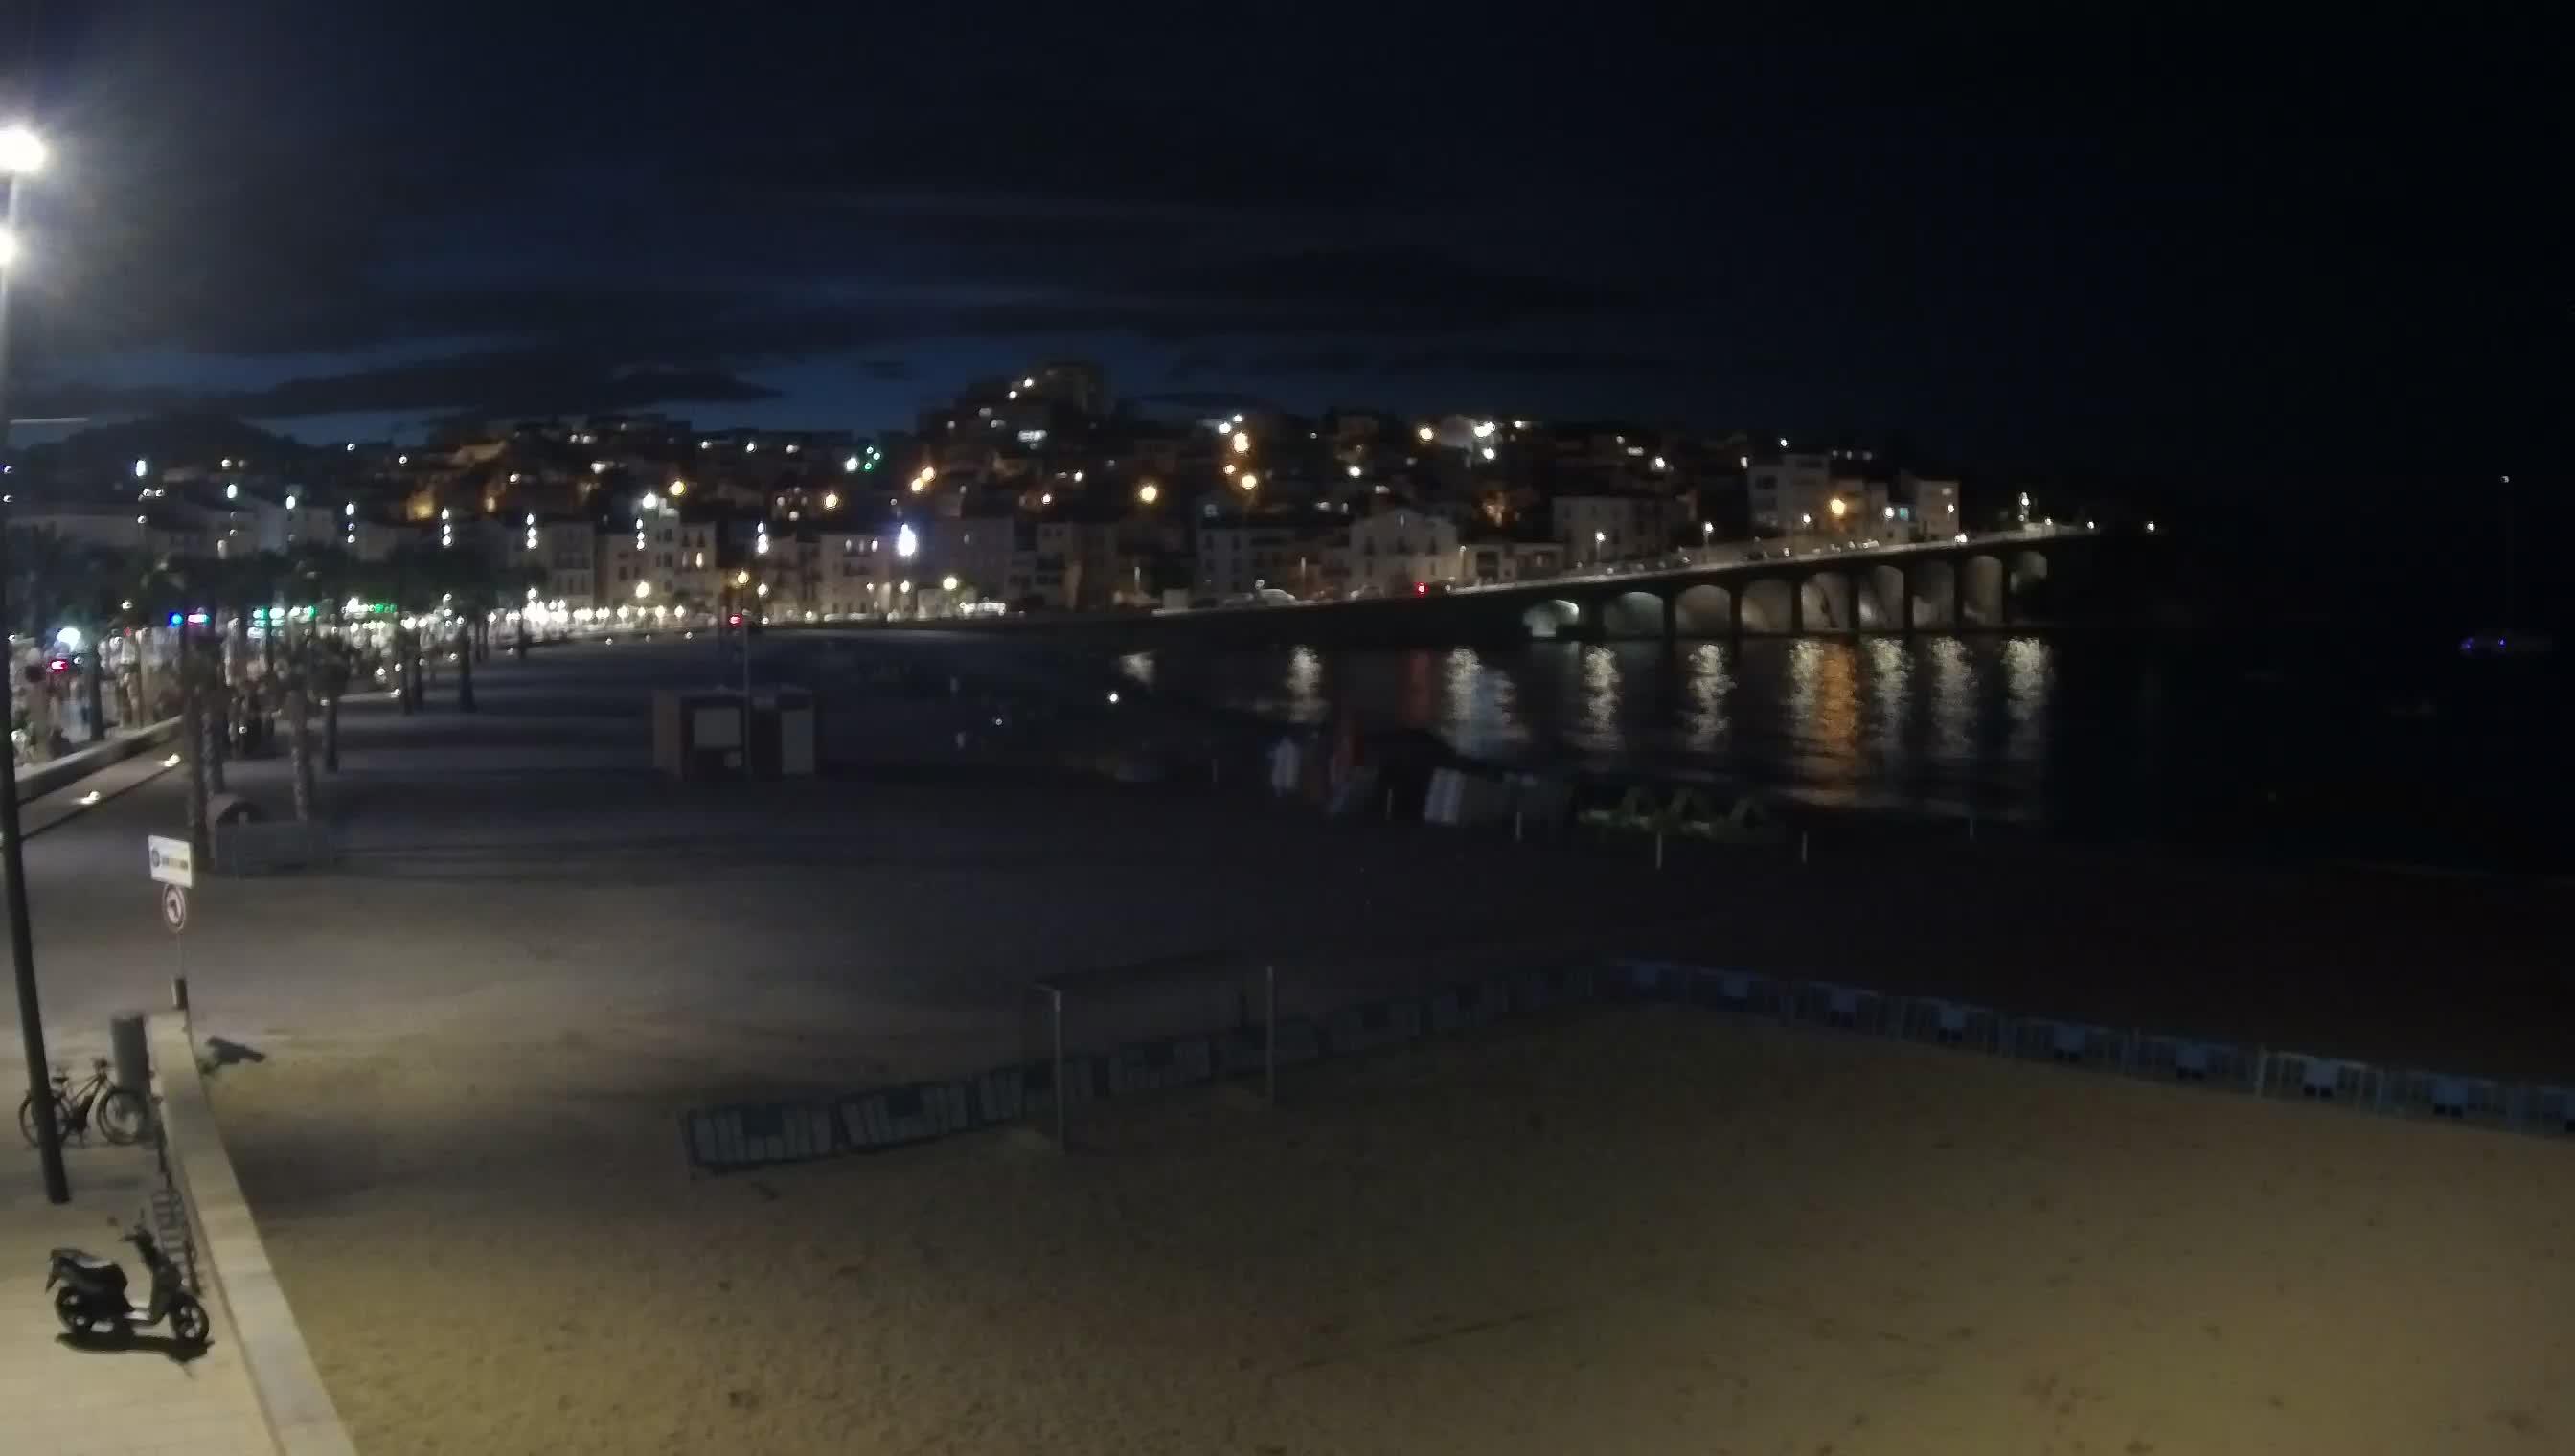 Banyuls-sur-Mer Fri. 22:22